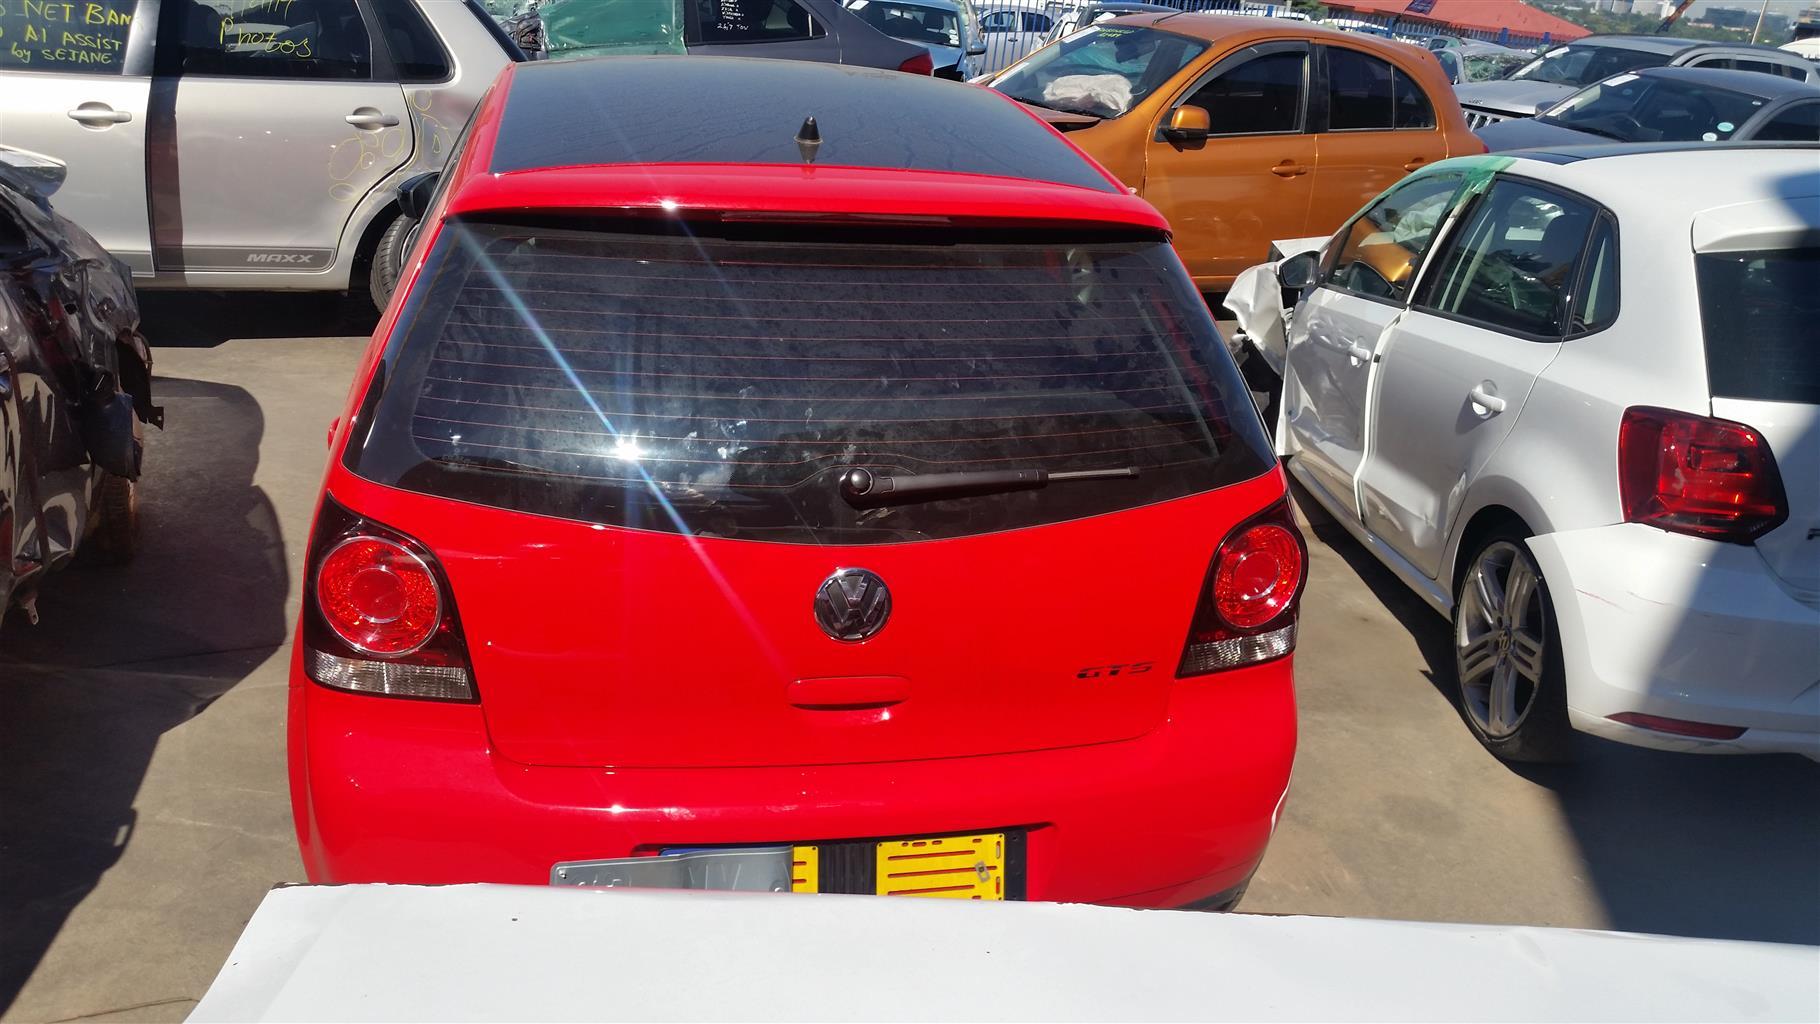 Accident Damaged Cars For Sale Rebuilds